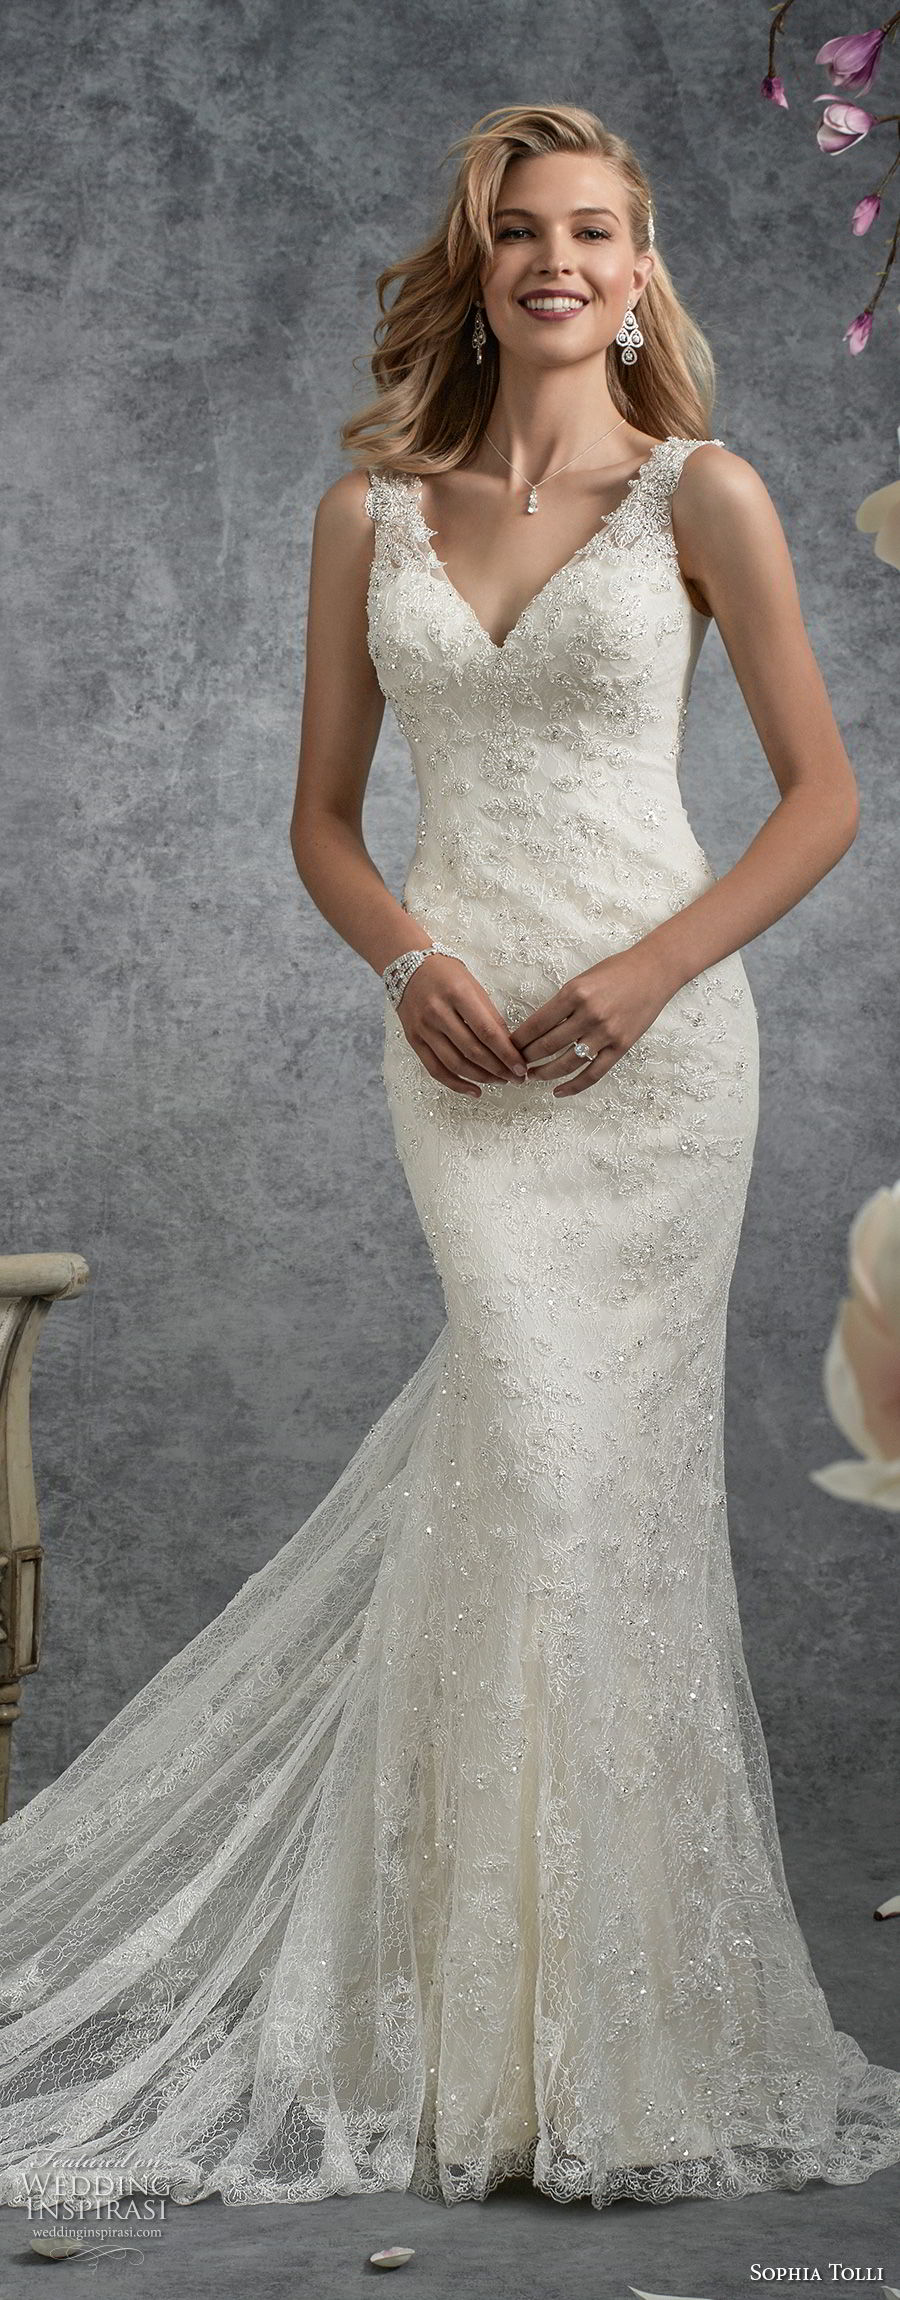 Sophia Tolli Fall 2017 Wedding Dresses Wedding Inspirasi,Casual Summer Beach Wedding Dresses